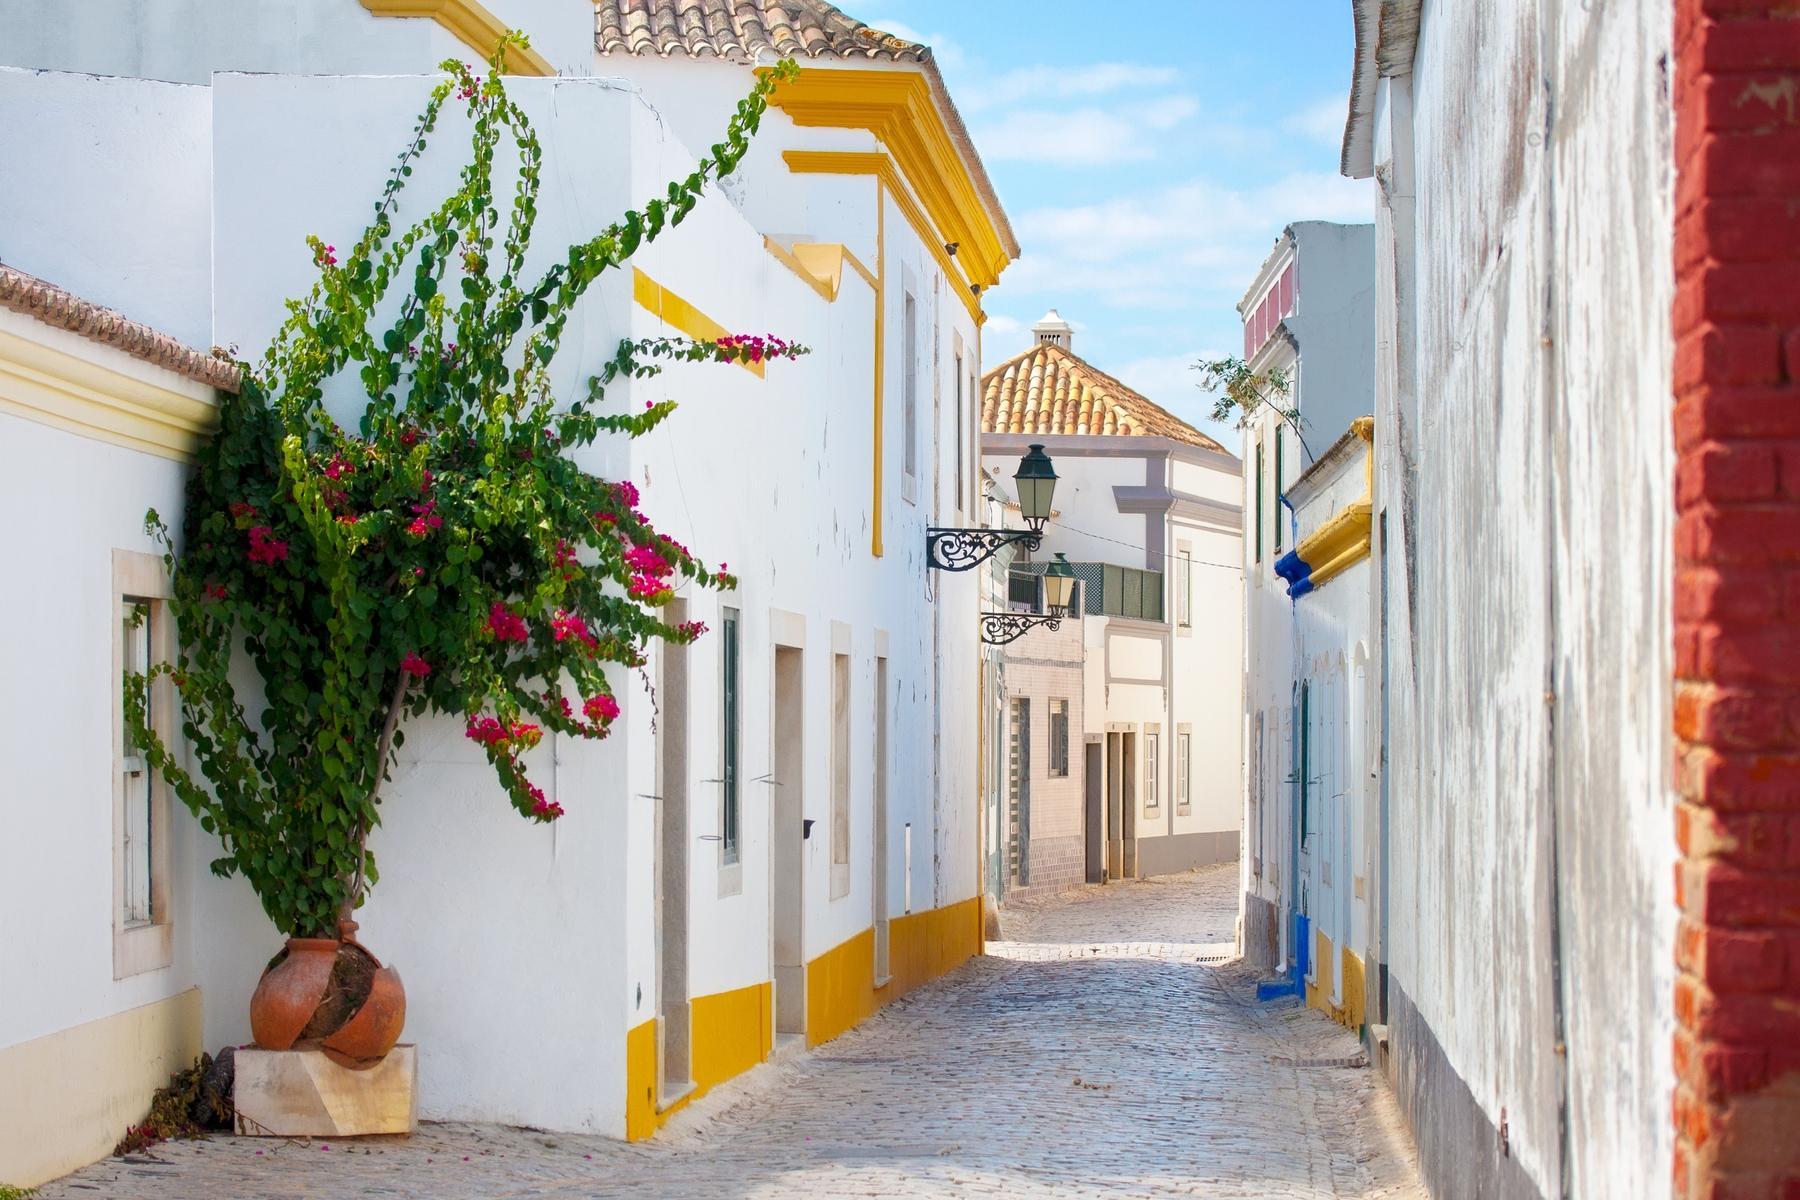 Europa samochodem: Algarve